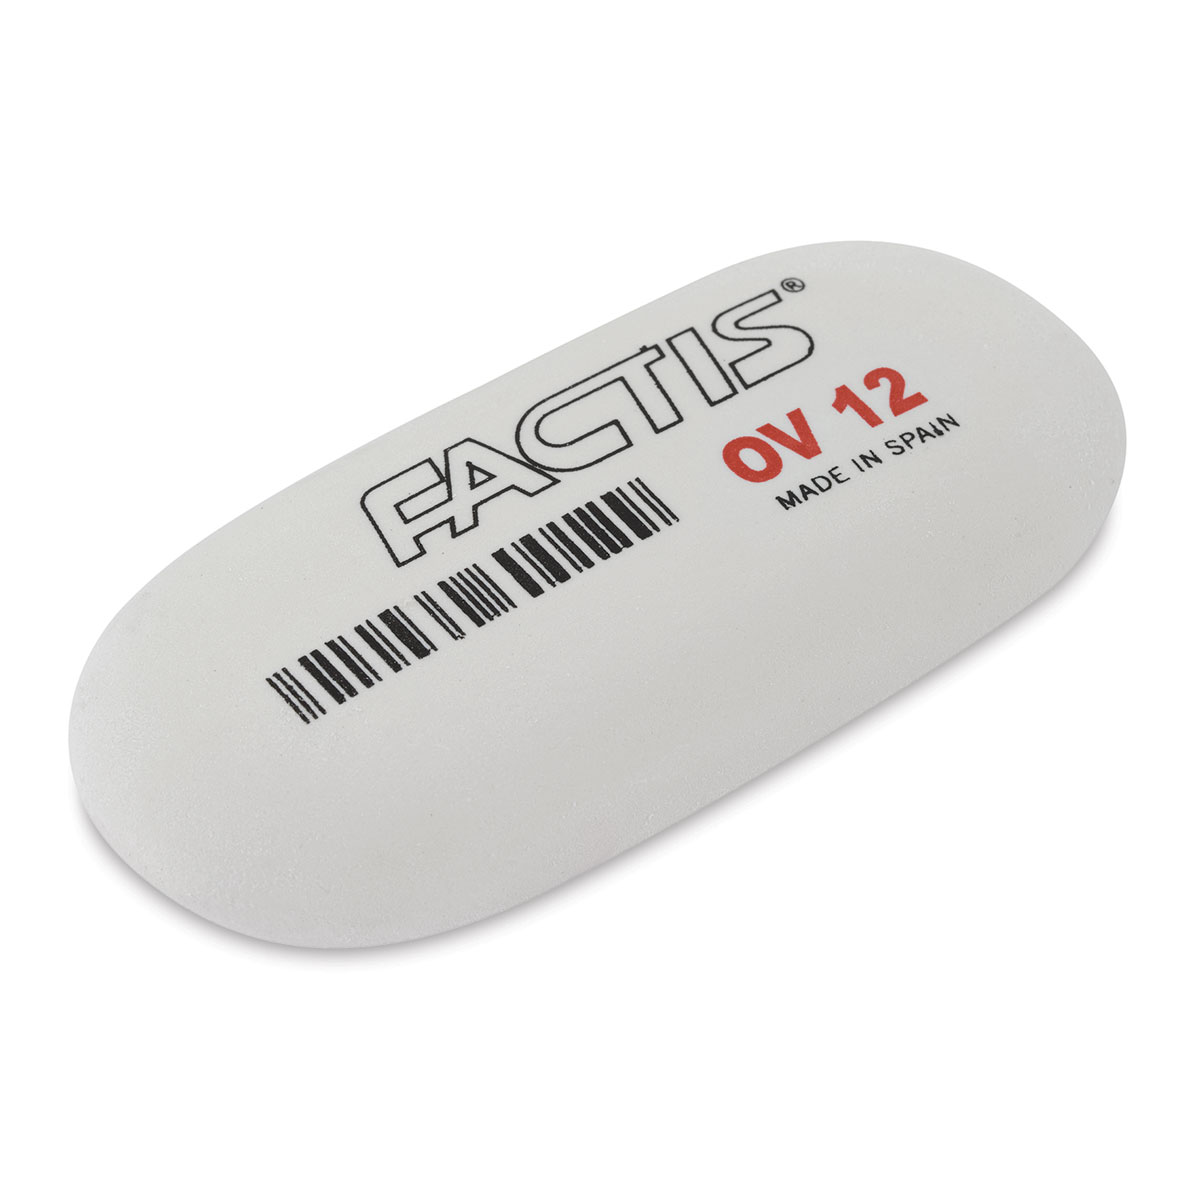 Generals Factis Extra Soft Eraser white PACK OF 24